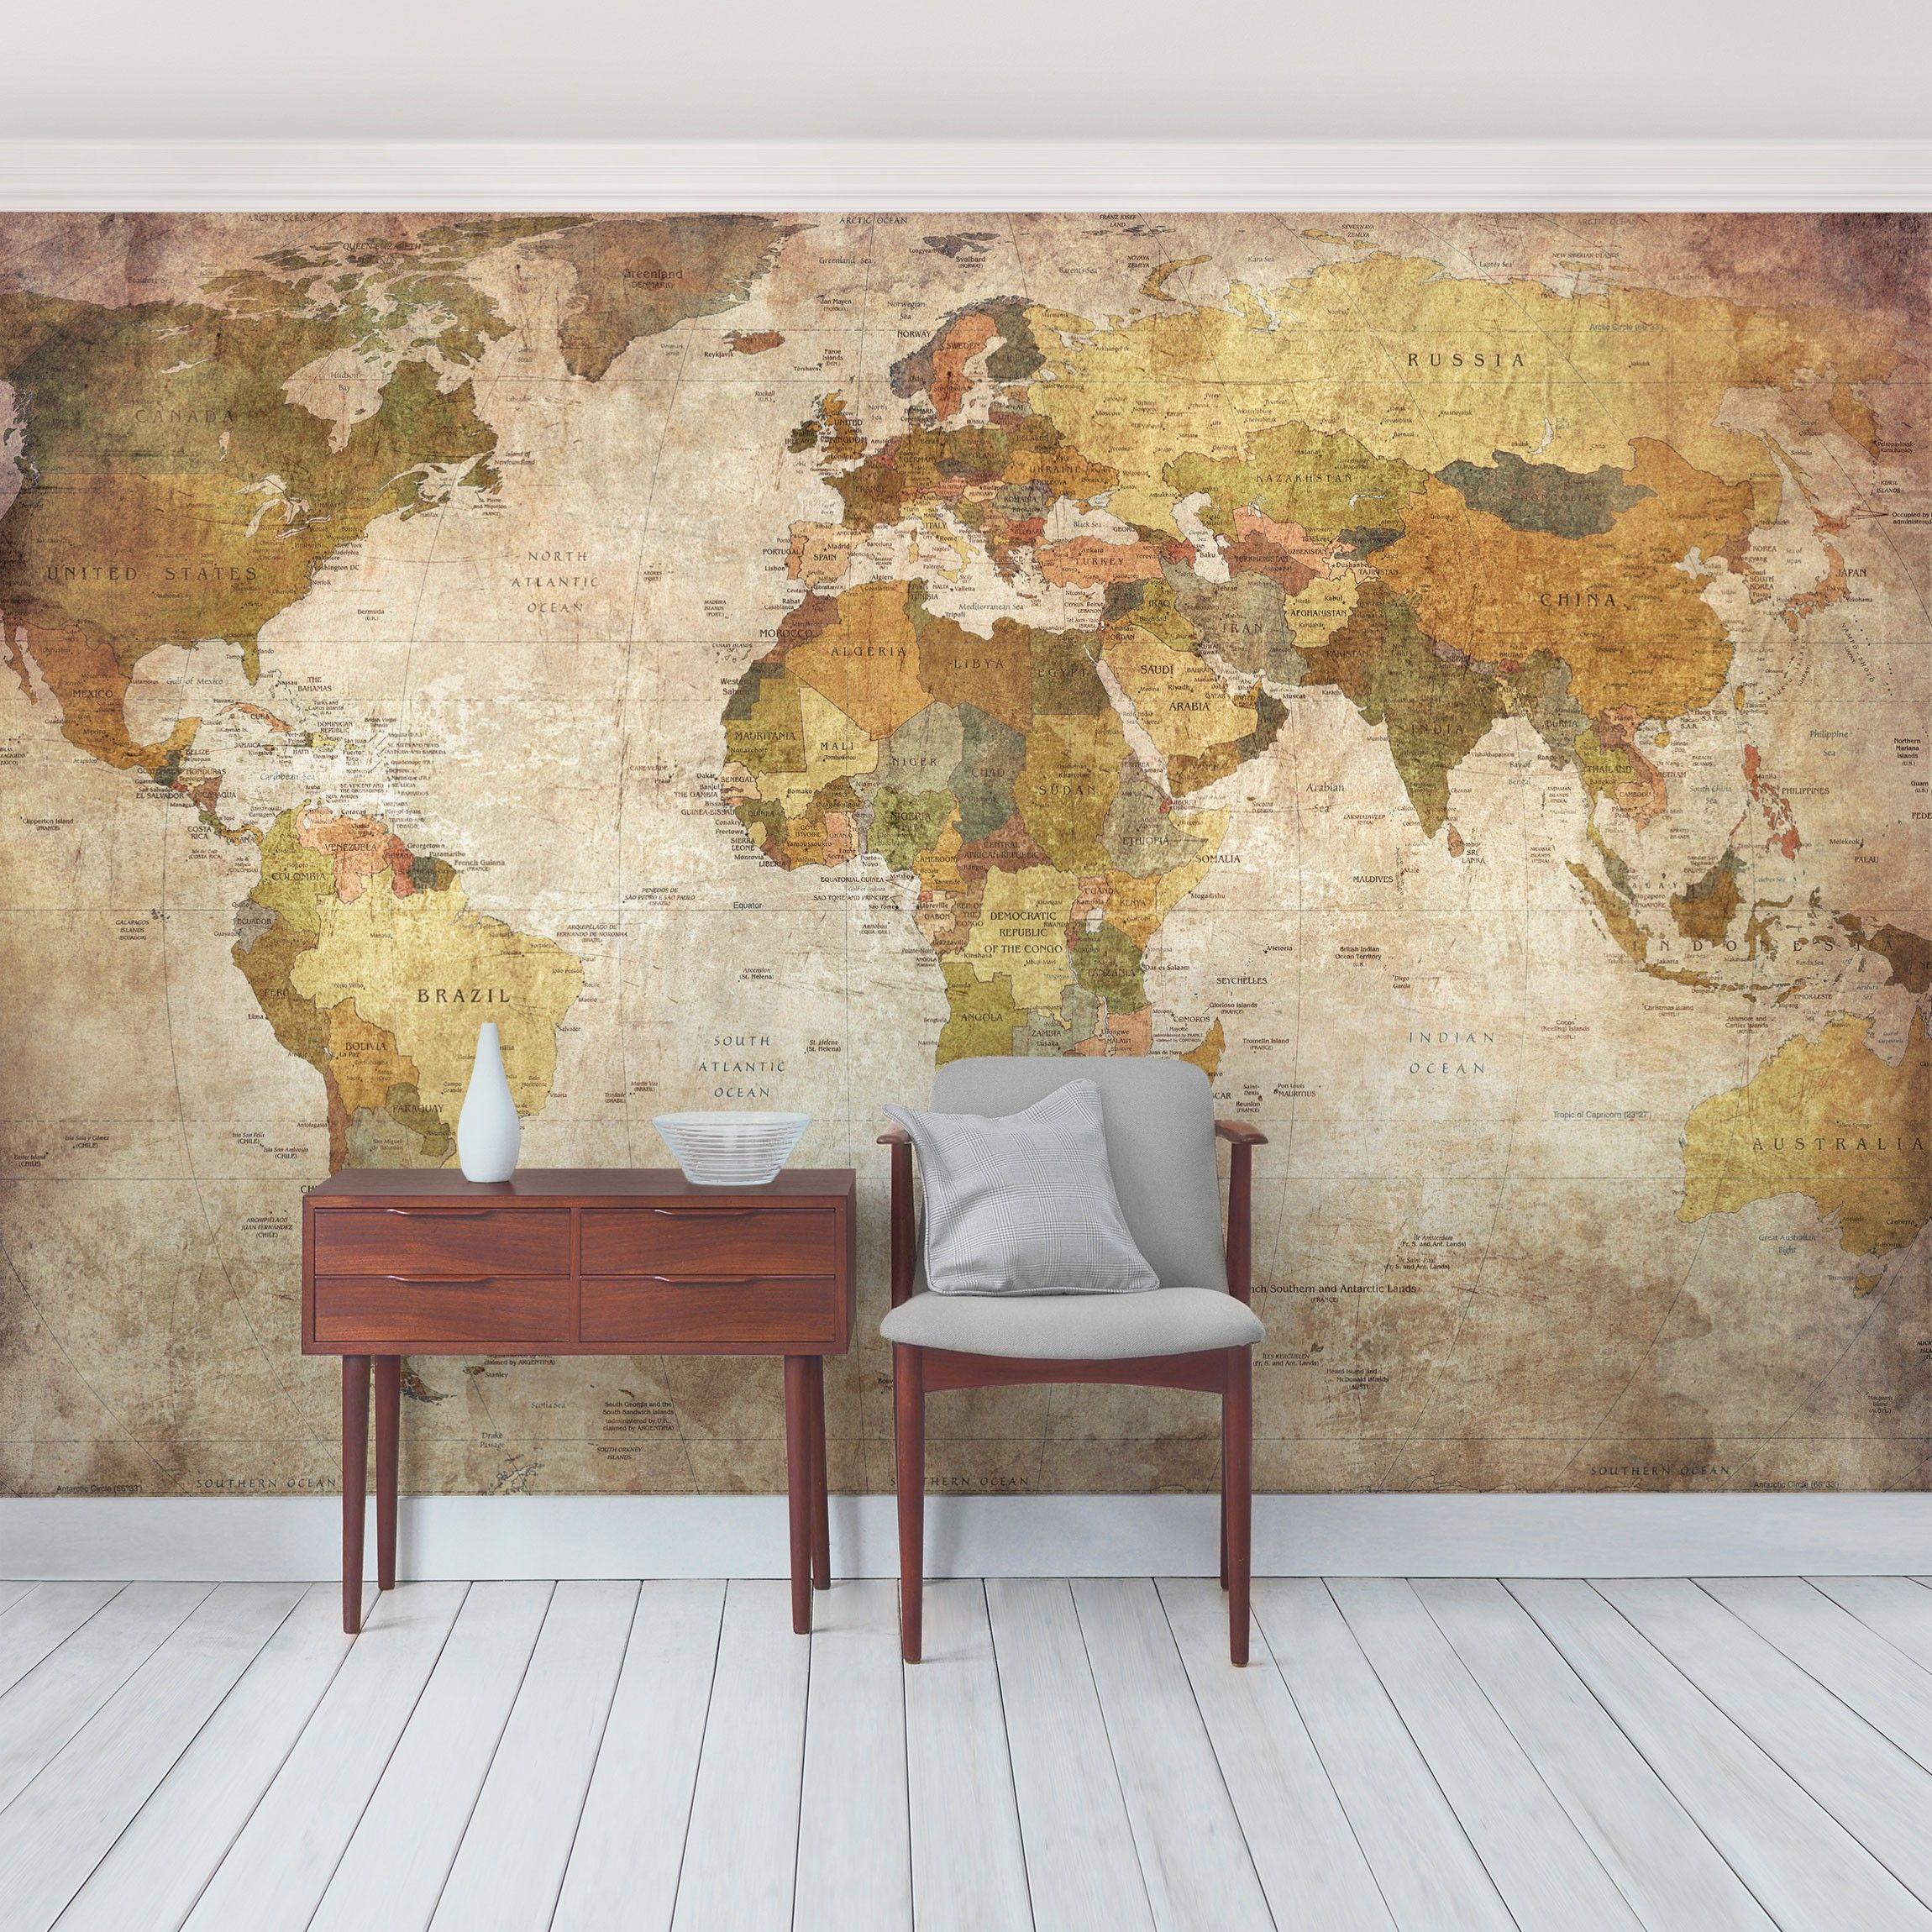 weltkarte fototapete selbstklebend weltkarte wandtapete klebend dekotapete wand ebay. Black Bedroom Furniture Sets. Home Design Ideas